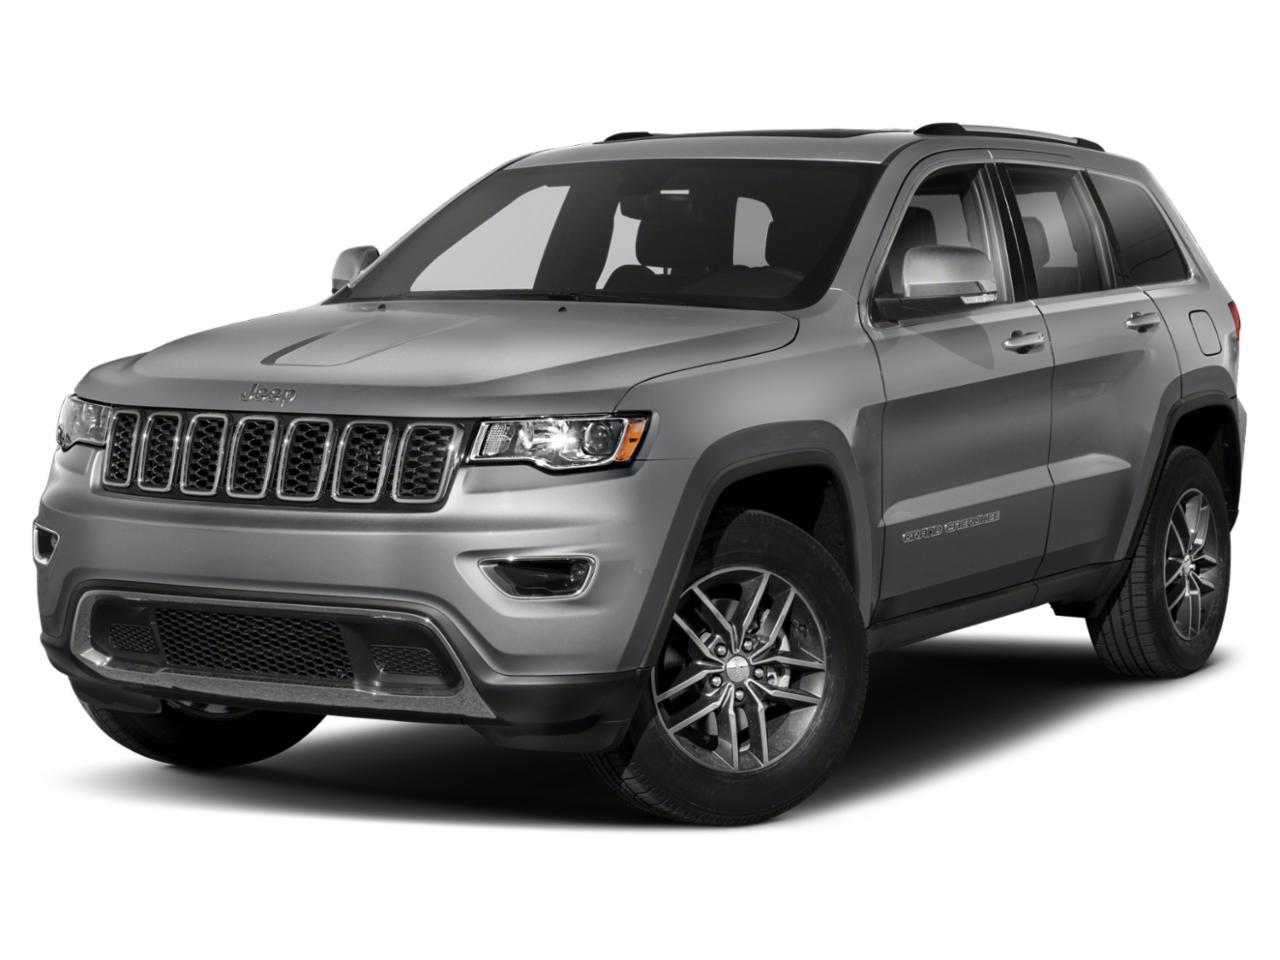 2018 Jeep Grand Cherokee Vehicle Photo in Nashua, NH 03060